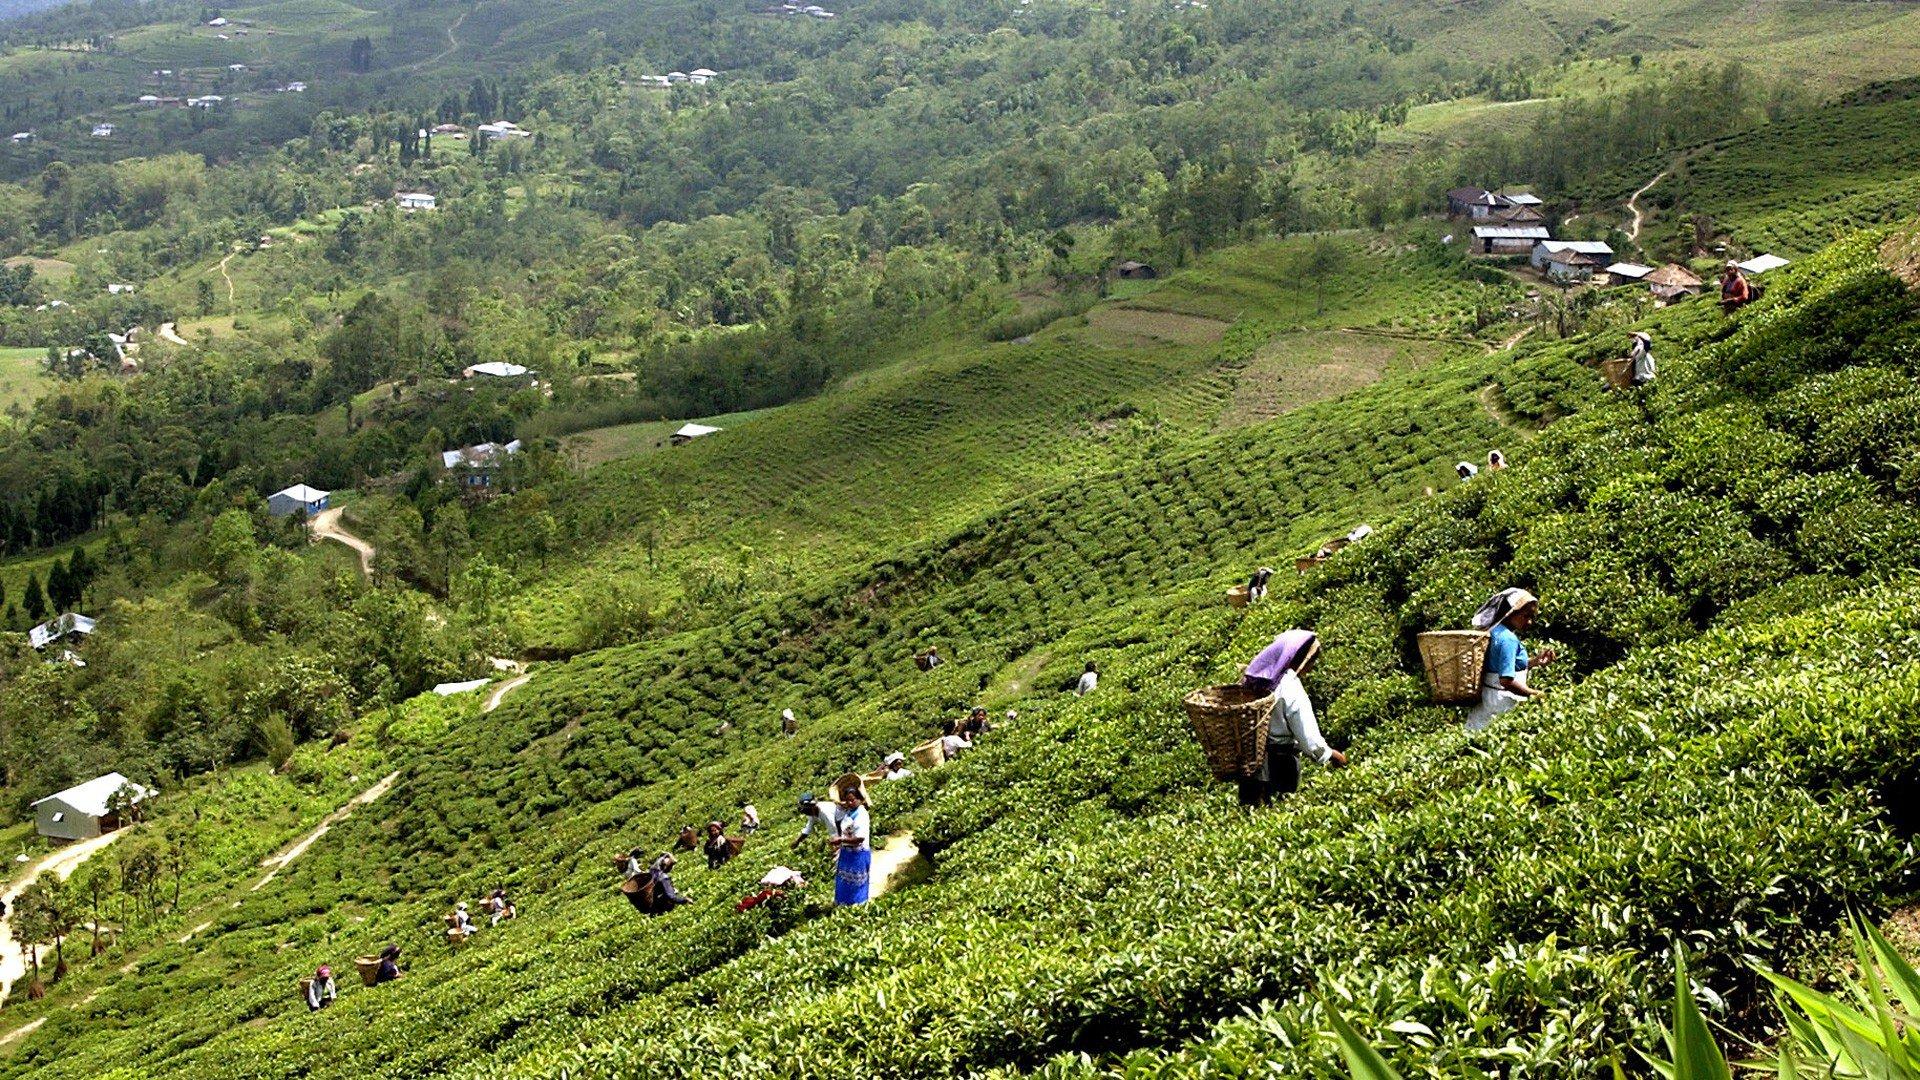 Kanyam Tea Garden